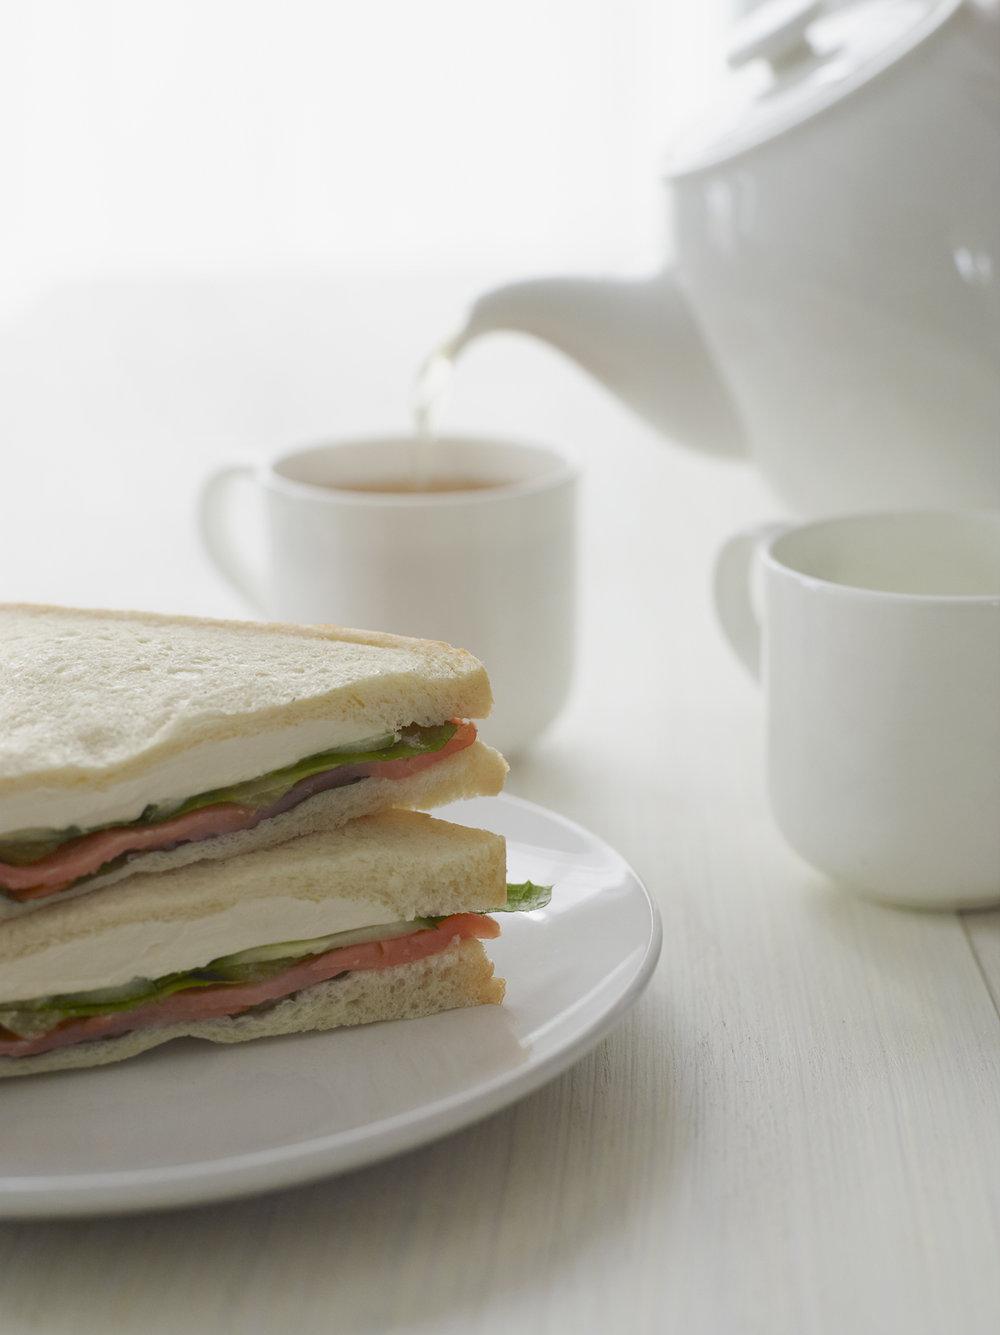 Sandwich036.jpg